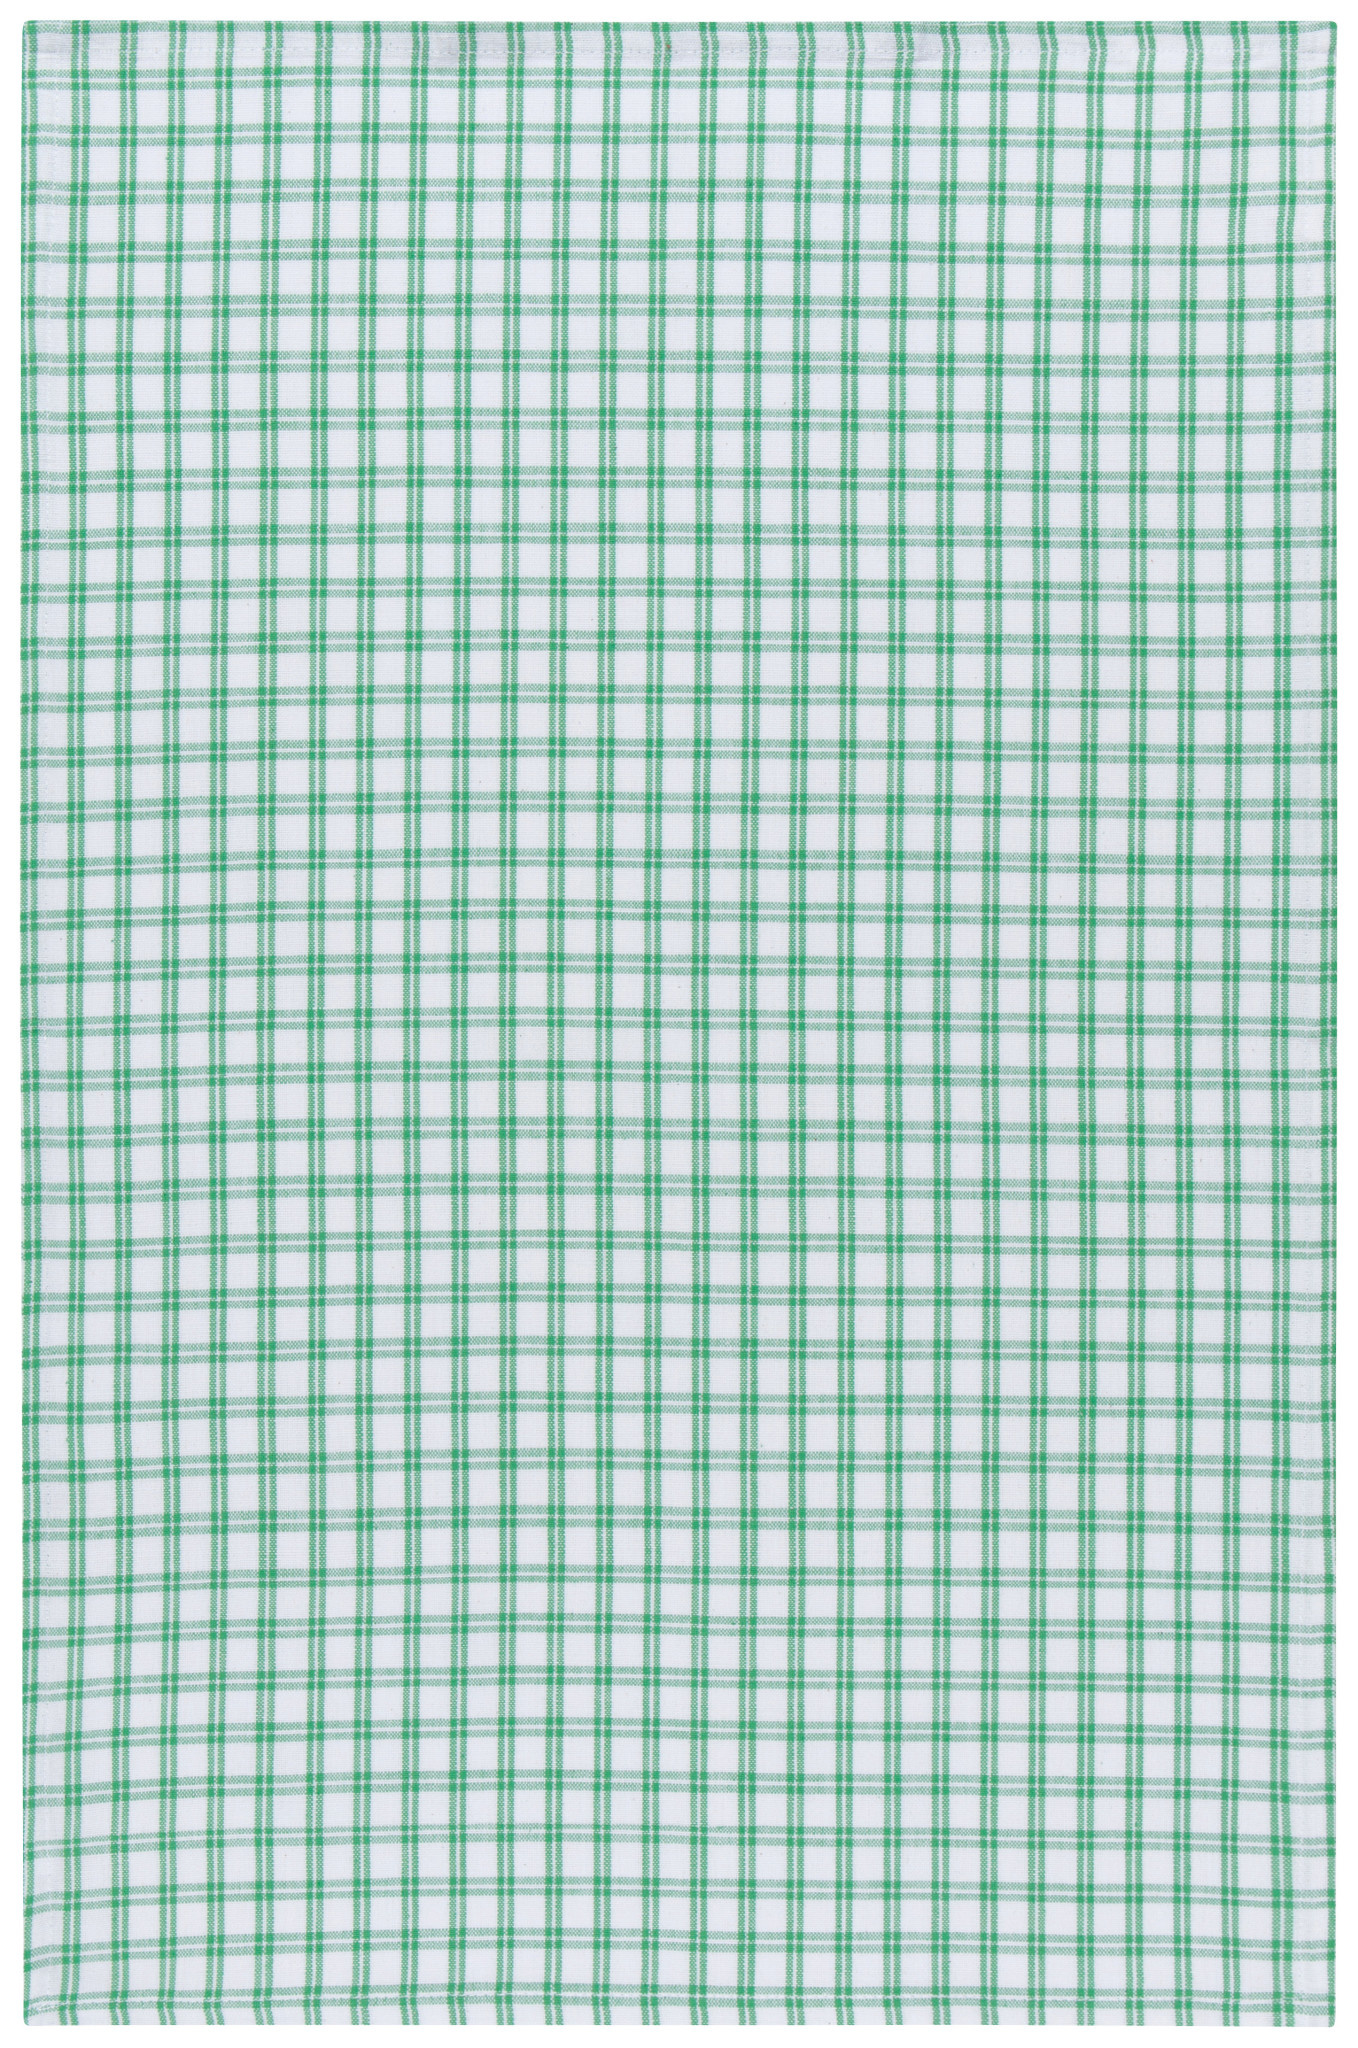 Danica Tea Towel - set of 3 Tic Tac Toe Greenbriar